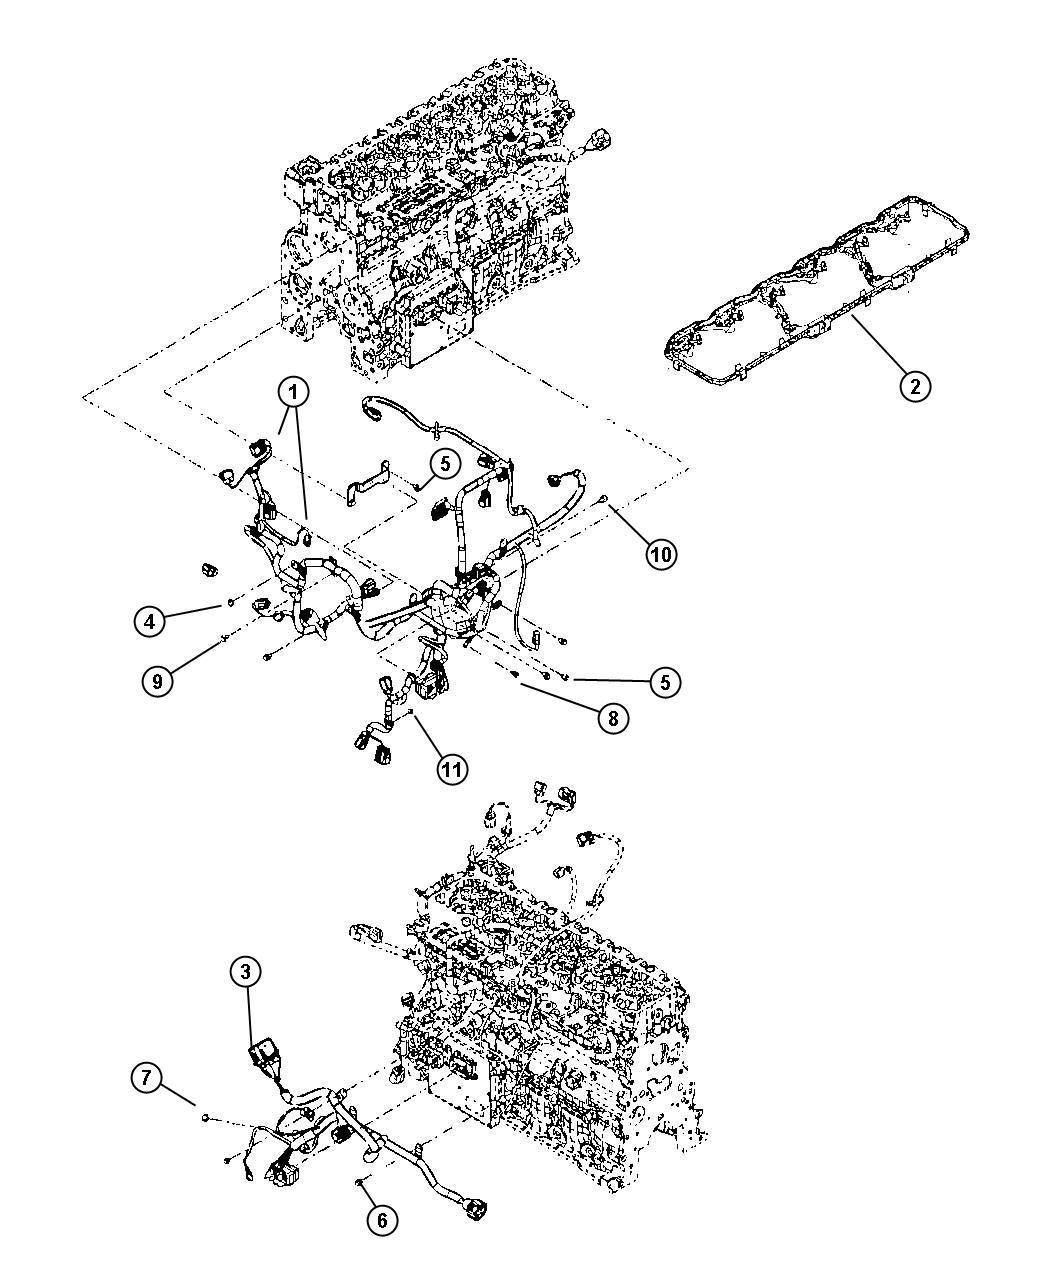 2010 Dodge Ram 3500 Wiring. Engine. [50 state emissions